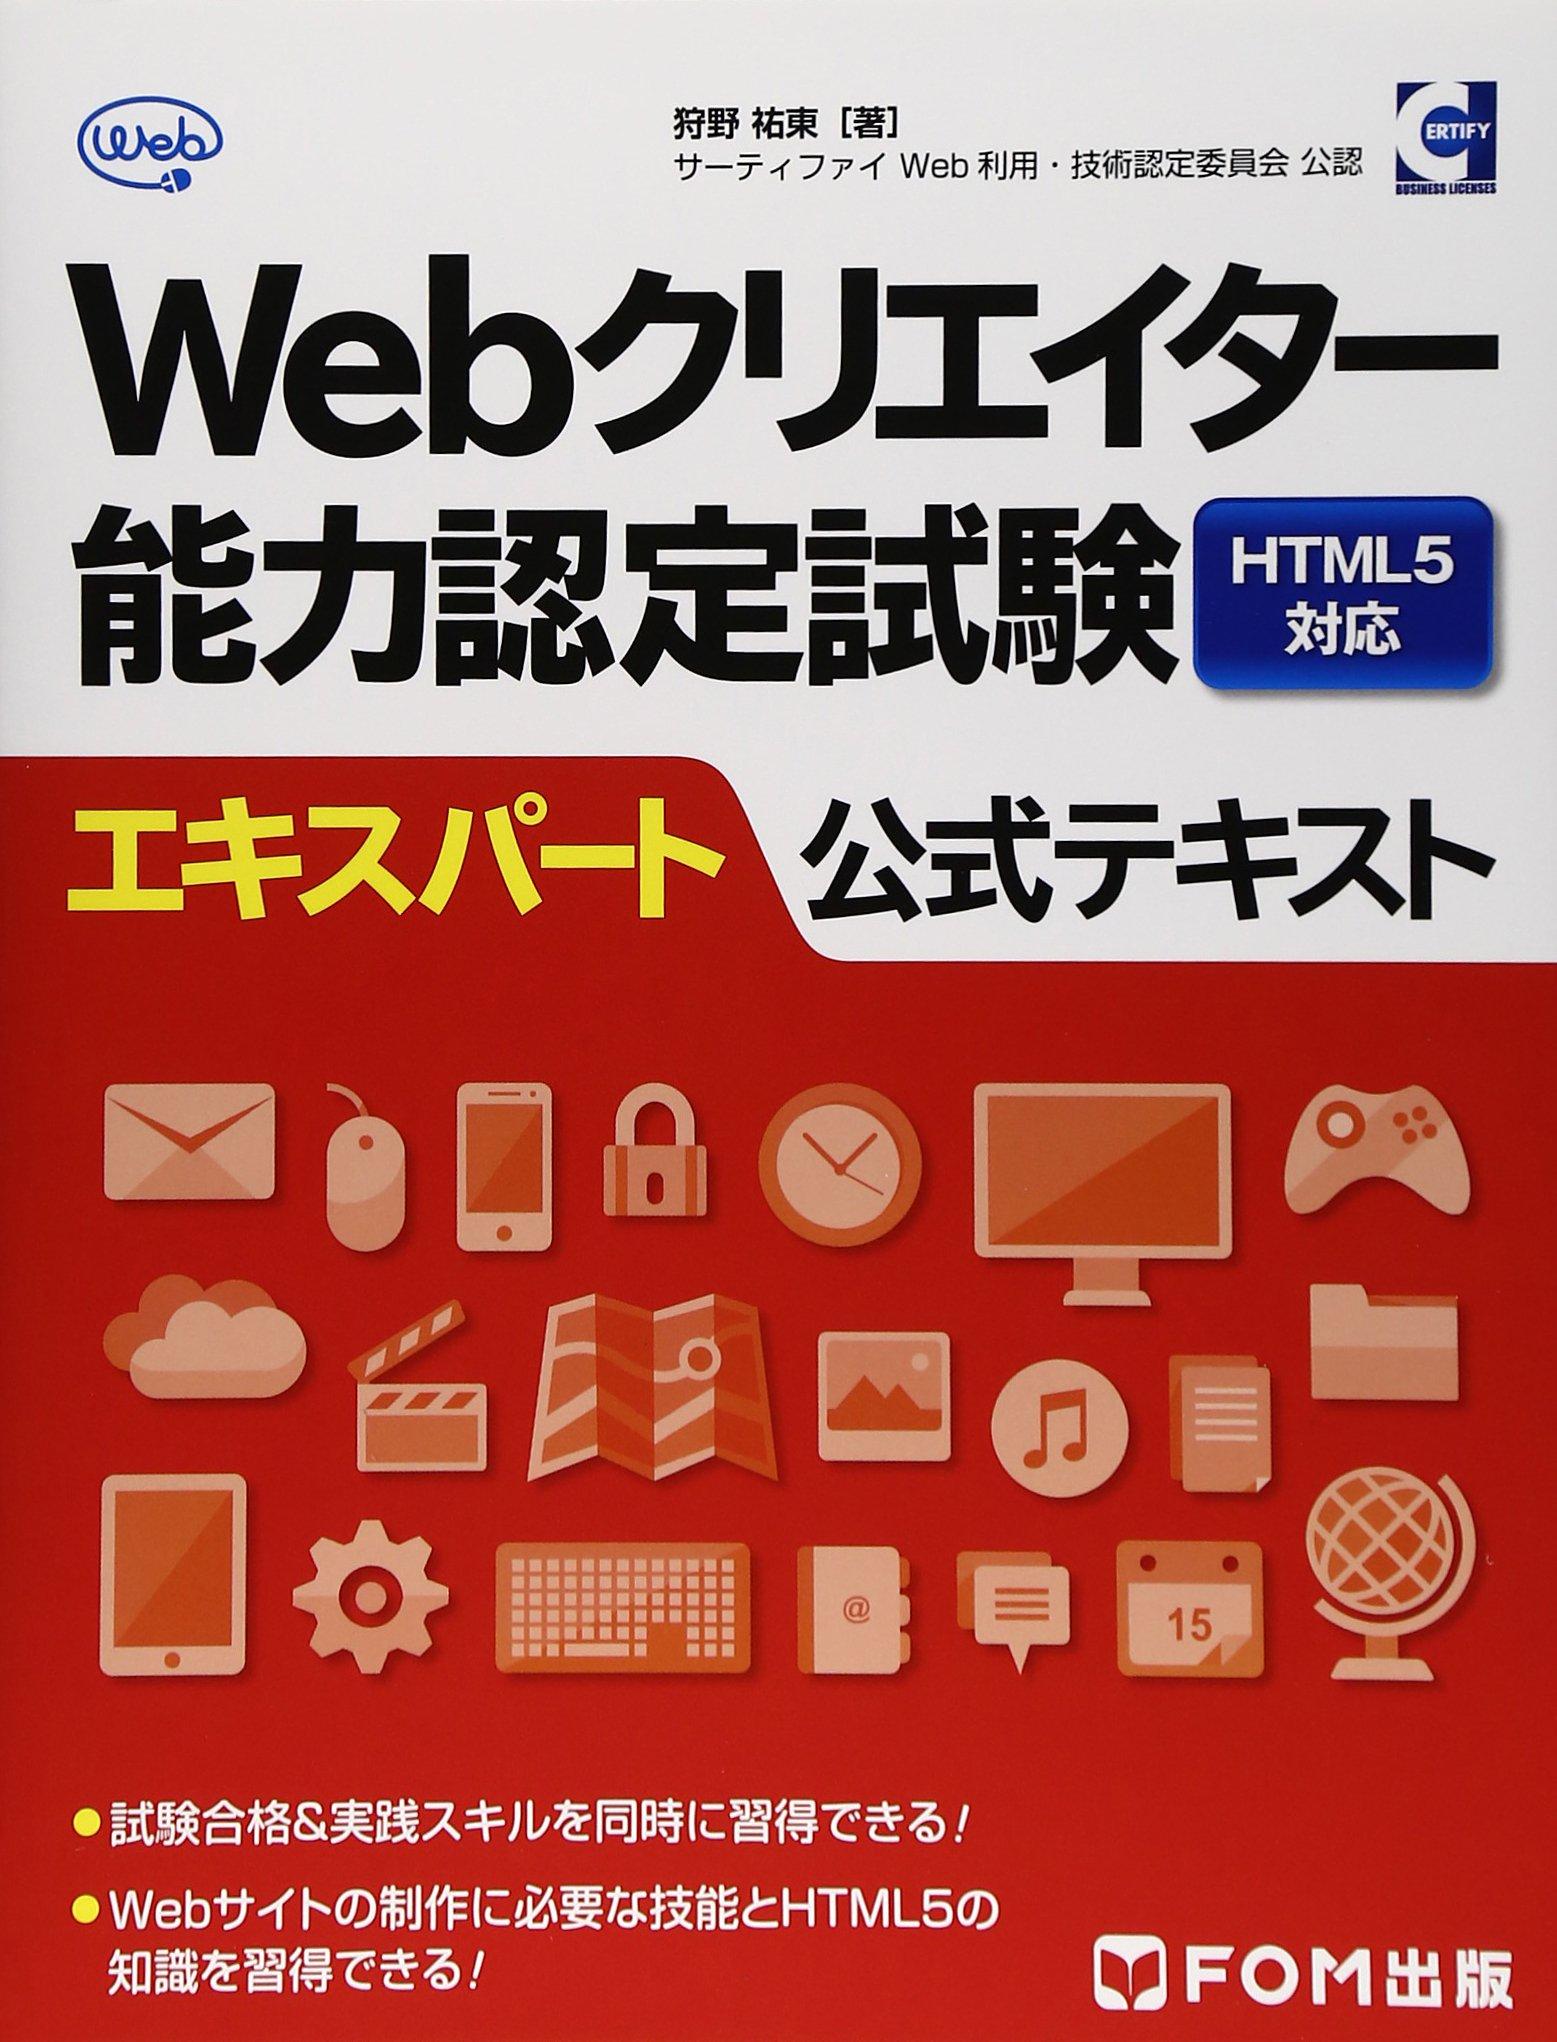 Web クリエイター 能力 認定 試験 試験内容(HTML5対応版)|Webクリエイター能力認定試験|資格検定のサ...